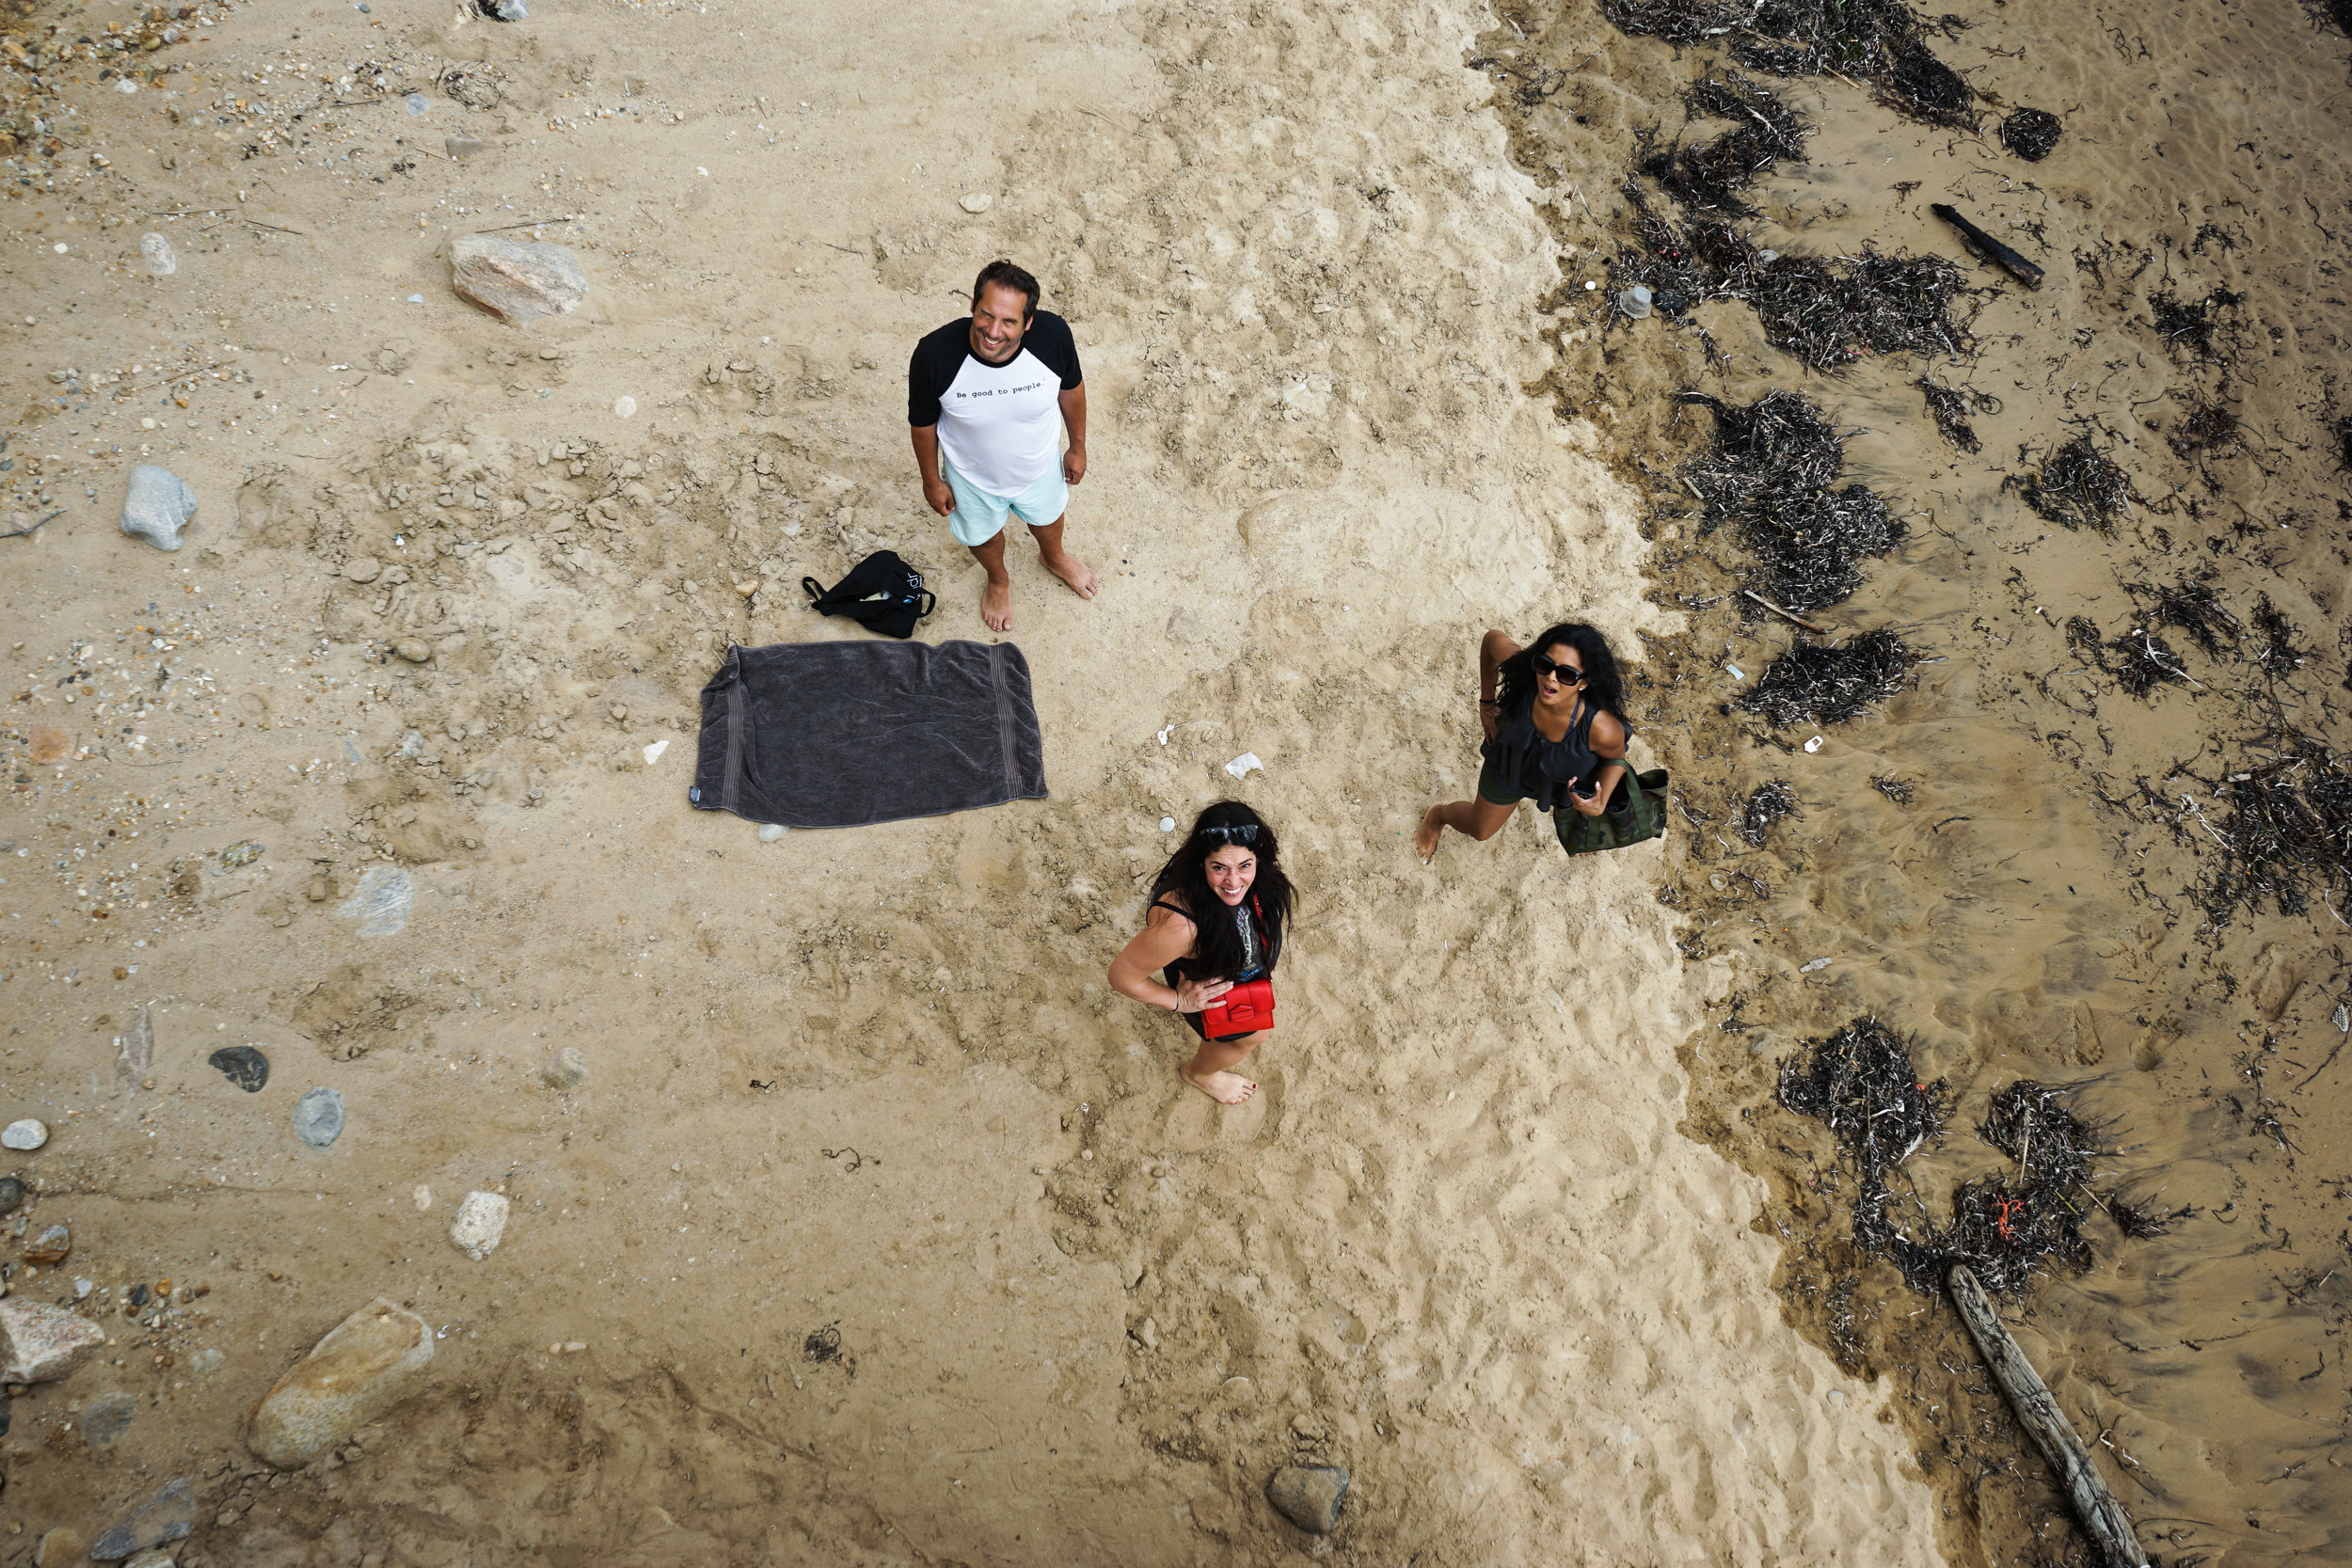 Aerial shot of Hitha Herzog, her husband Seth, and a friend on the beach below.